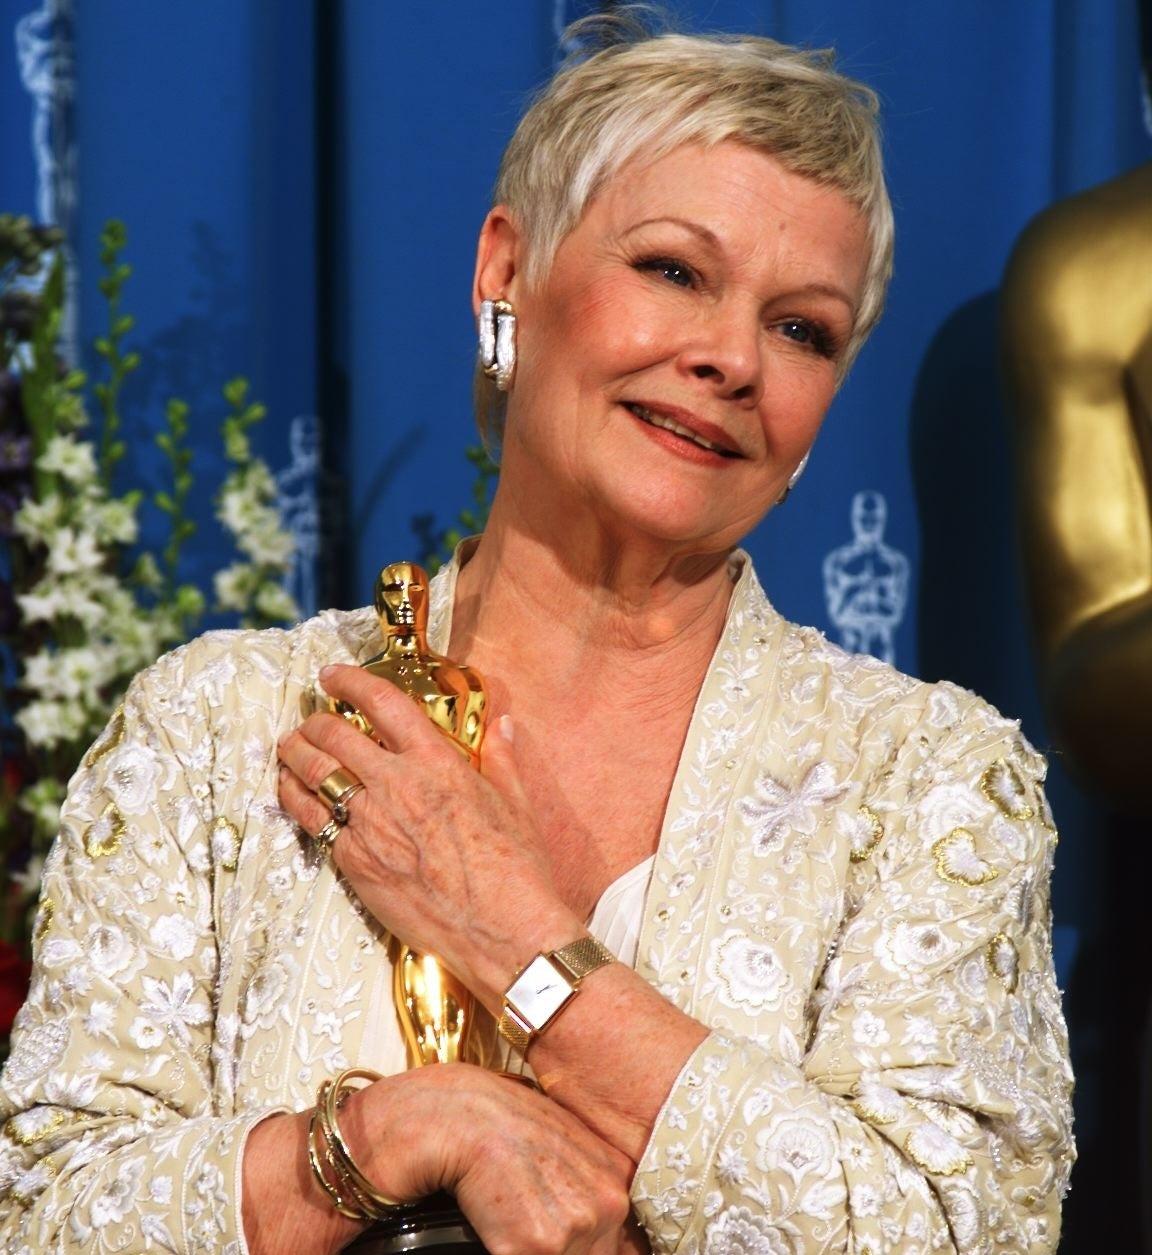 Judi Dench cradling her Oscar